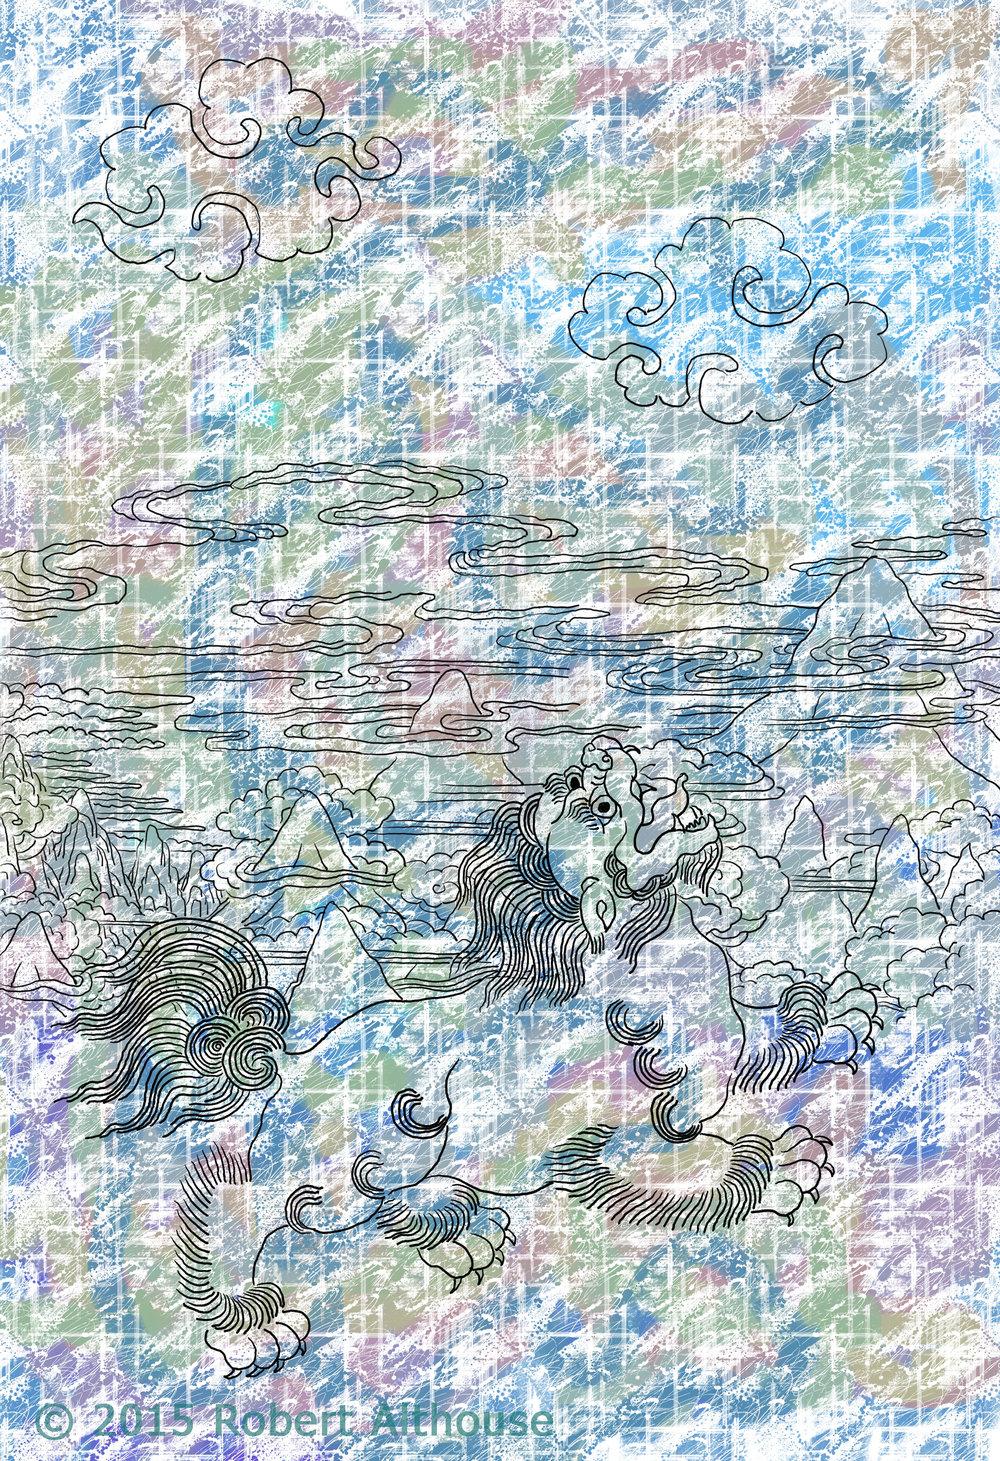 16_004-web-ps.jpg